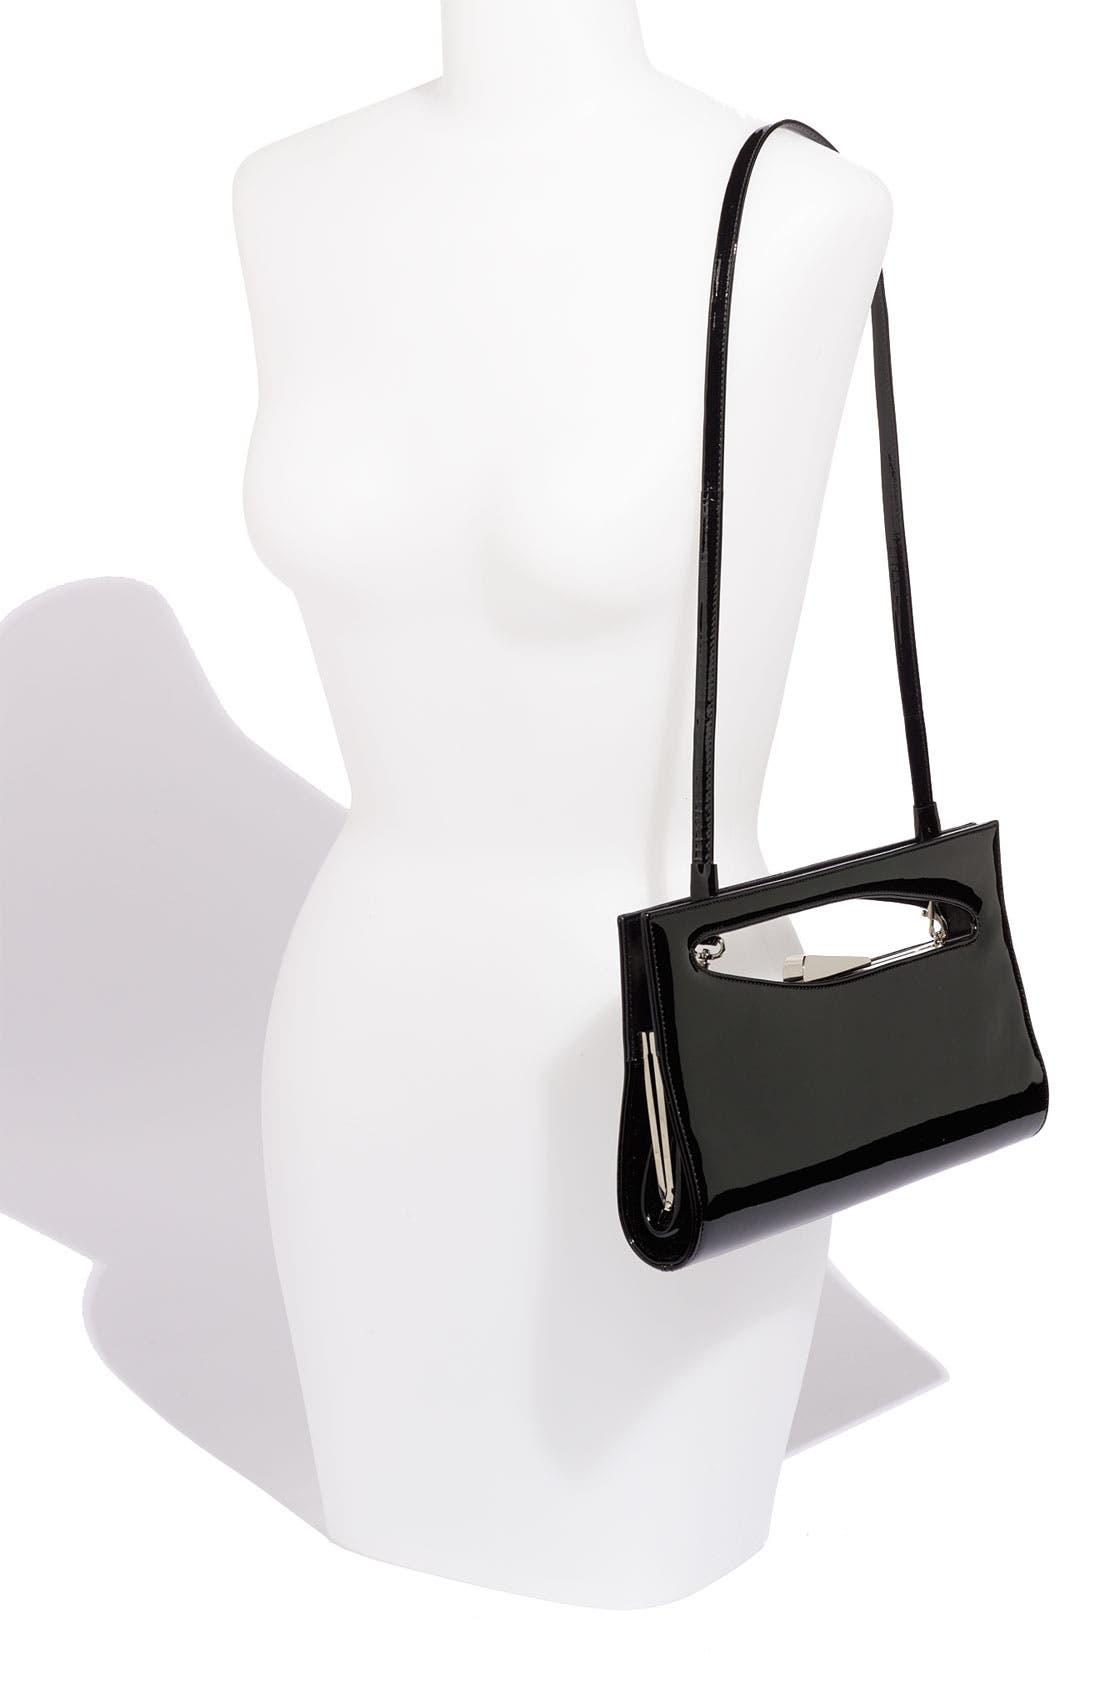 STUART WEITZMAN,                             'Grip' Handbag,                             Alternate thumbnail 2, color,                             002